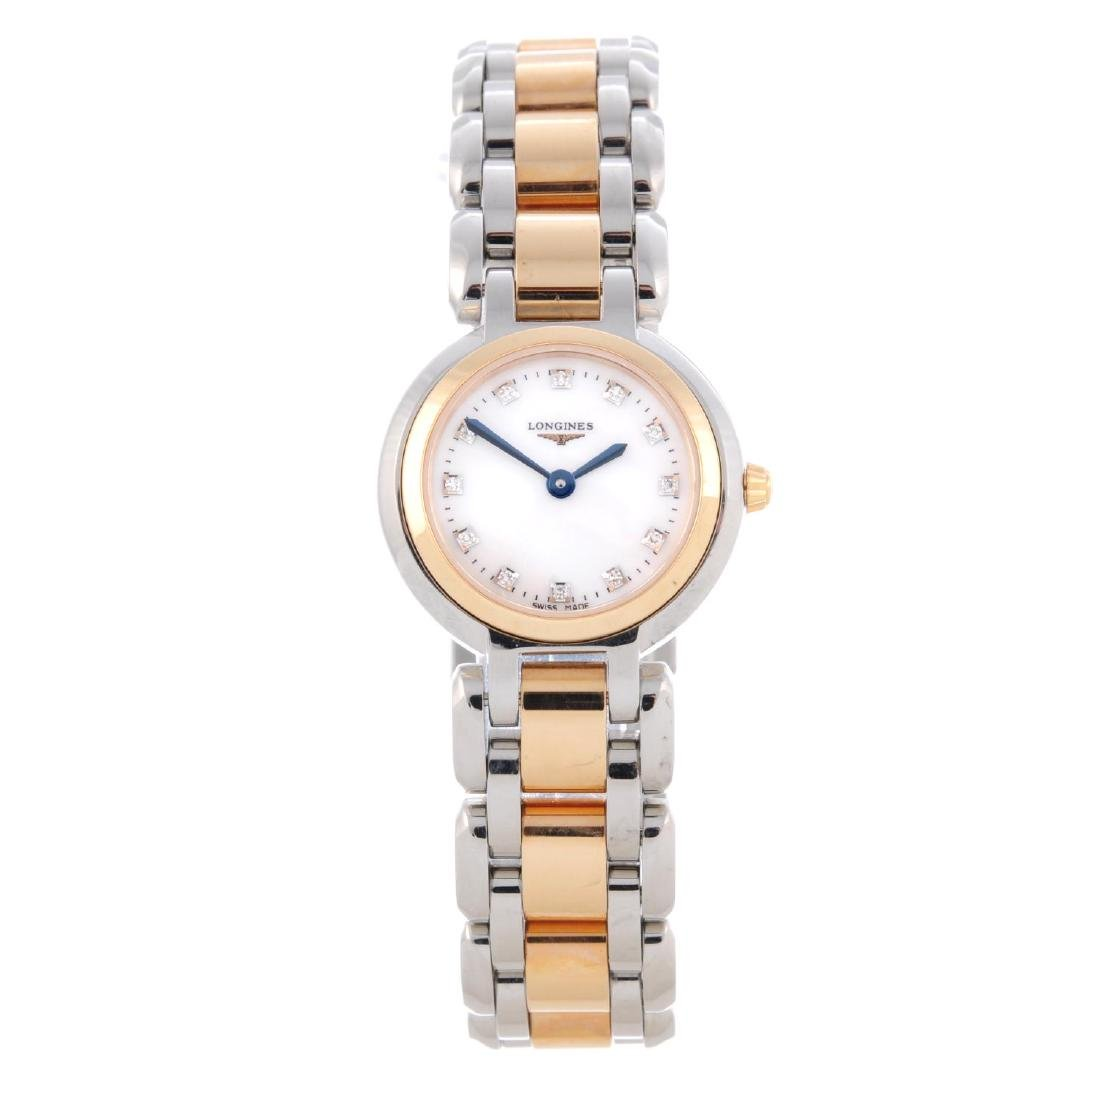 LONGINES - a lady's PrimaLuna bracelet watch. Stainless